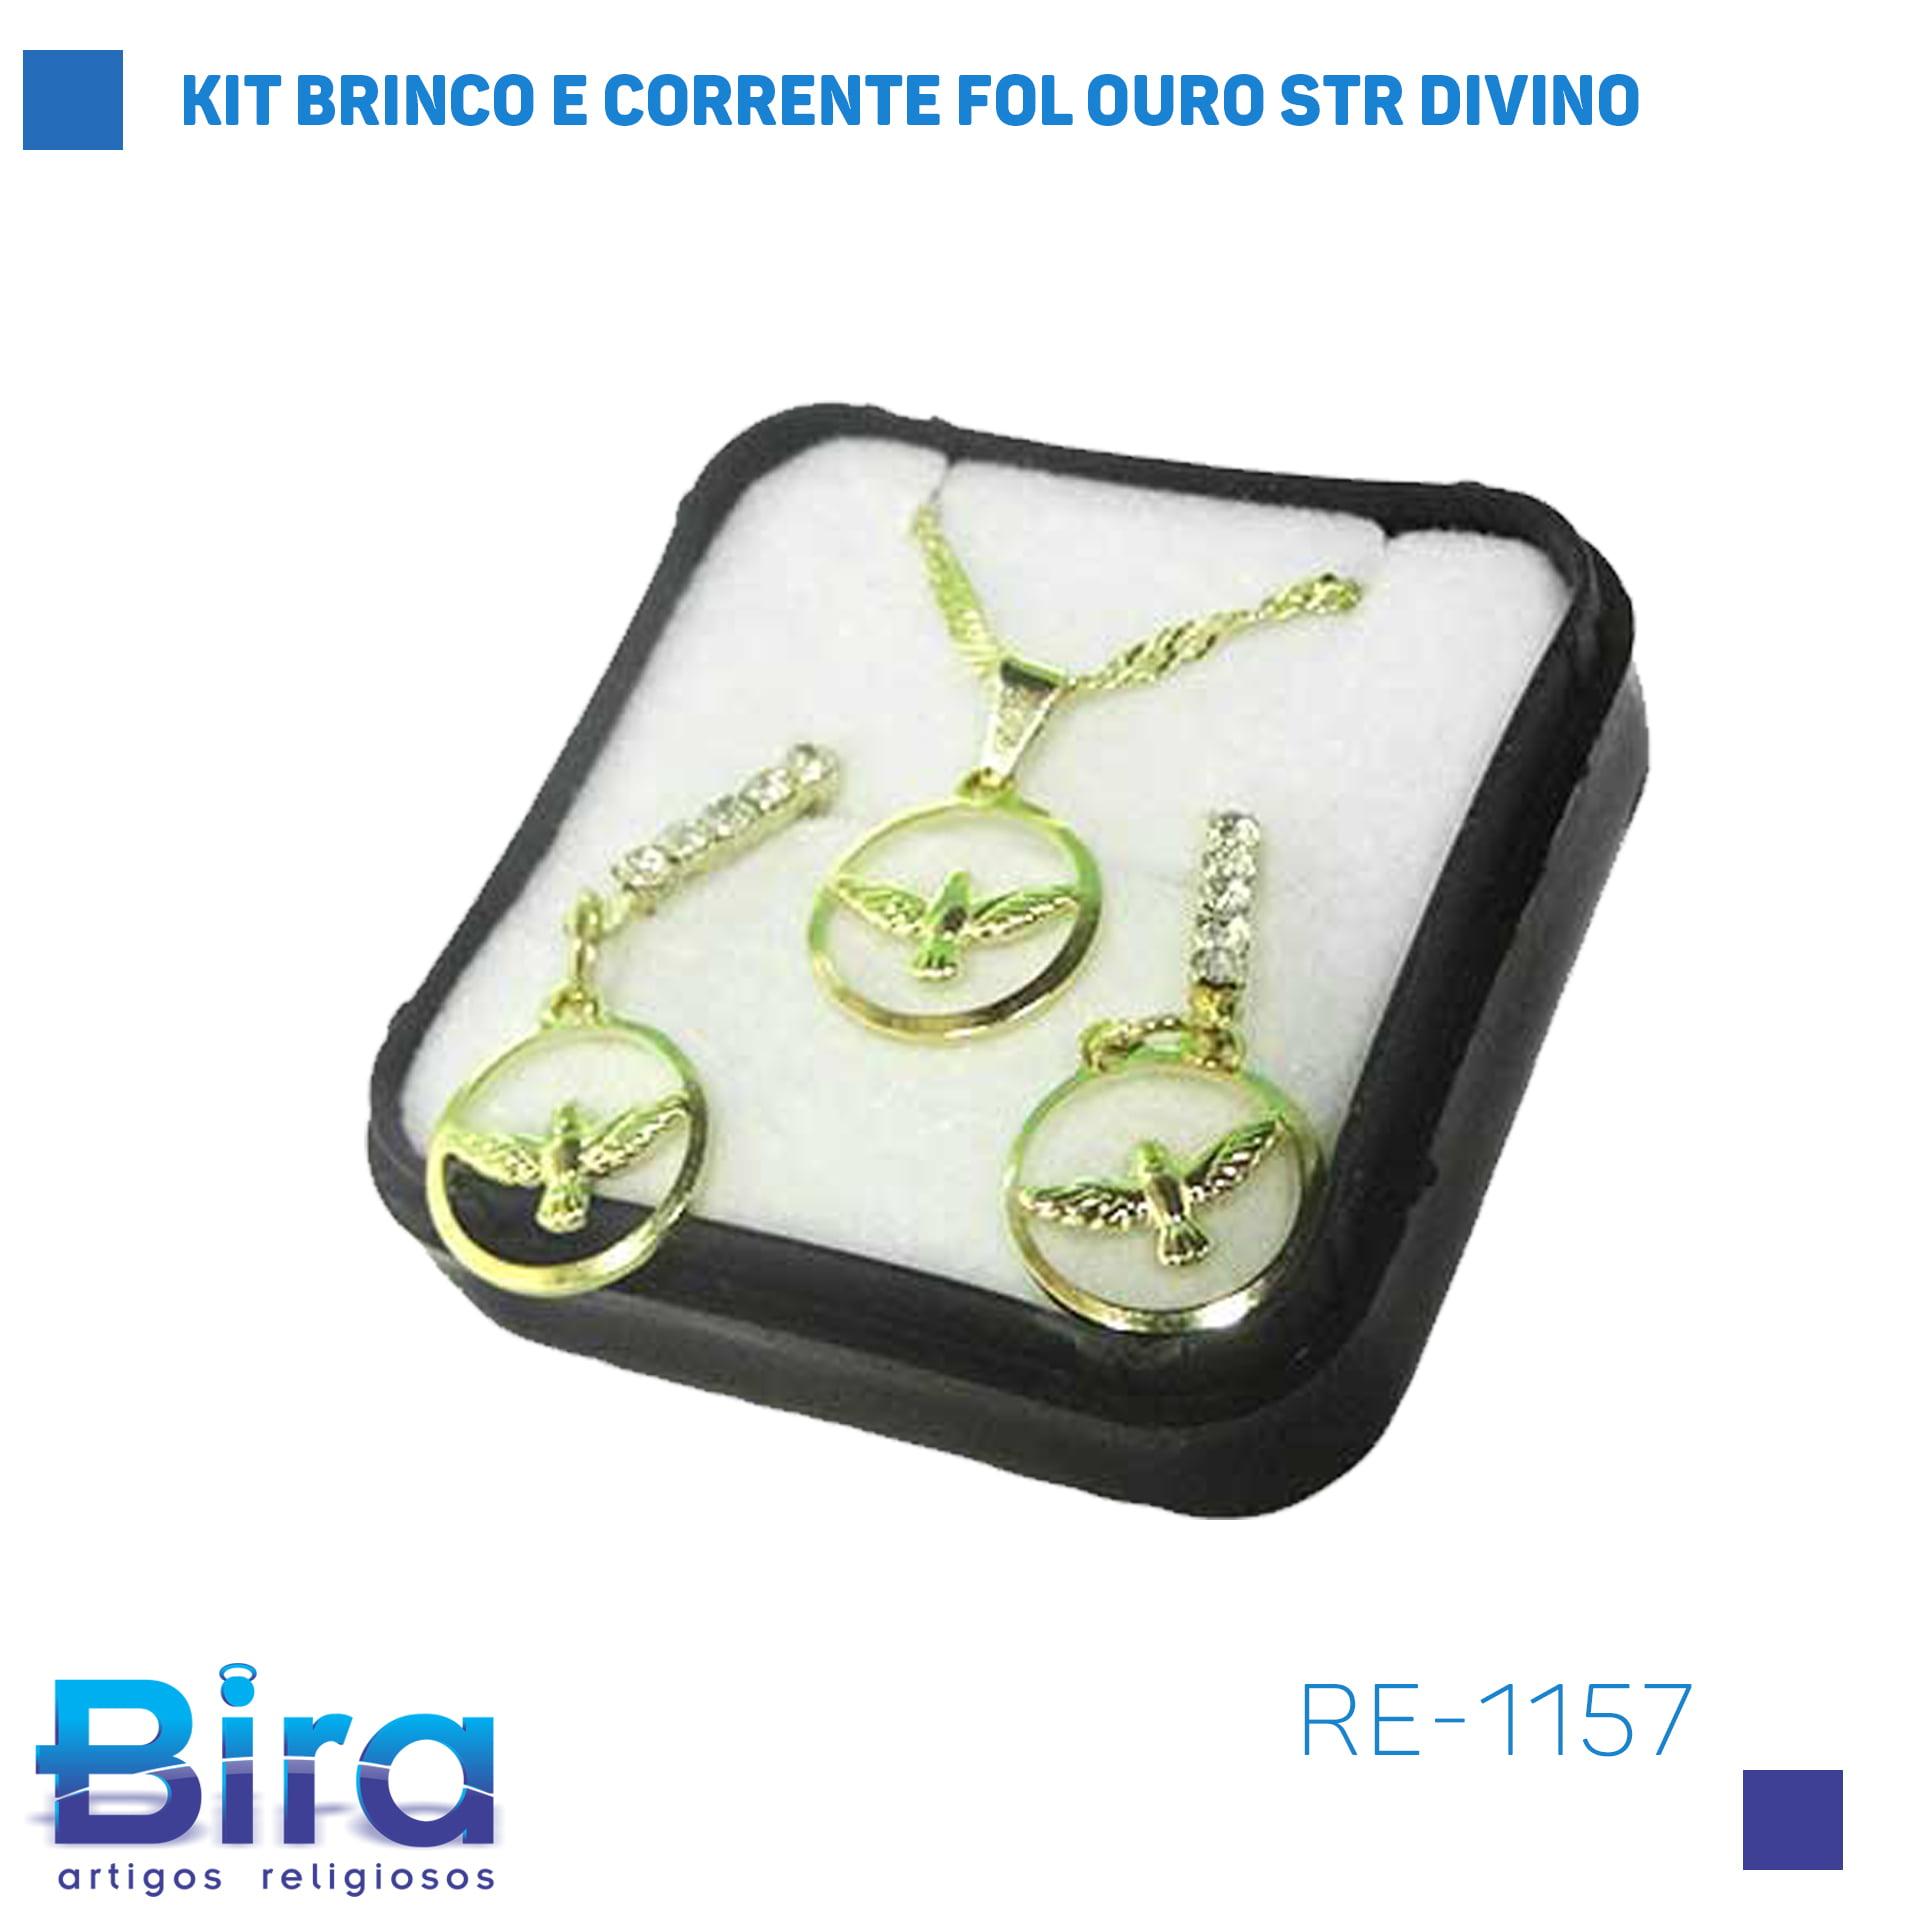 Bira Artigos Religiosos - KIT BRINCO E CORRENTE FOL OURO STR DIVINO Cód. RE-1157